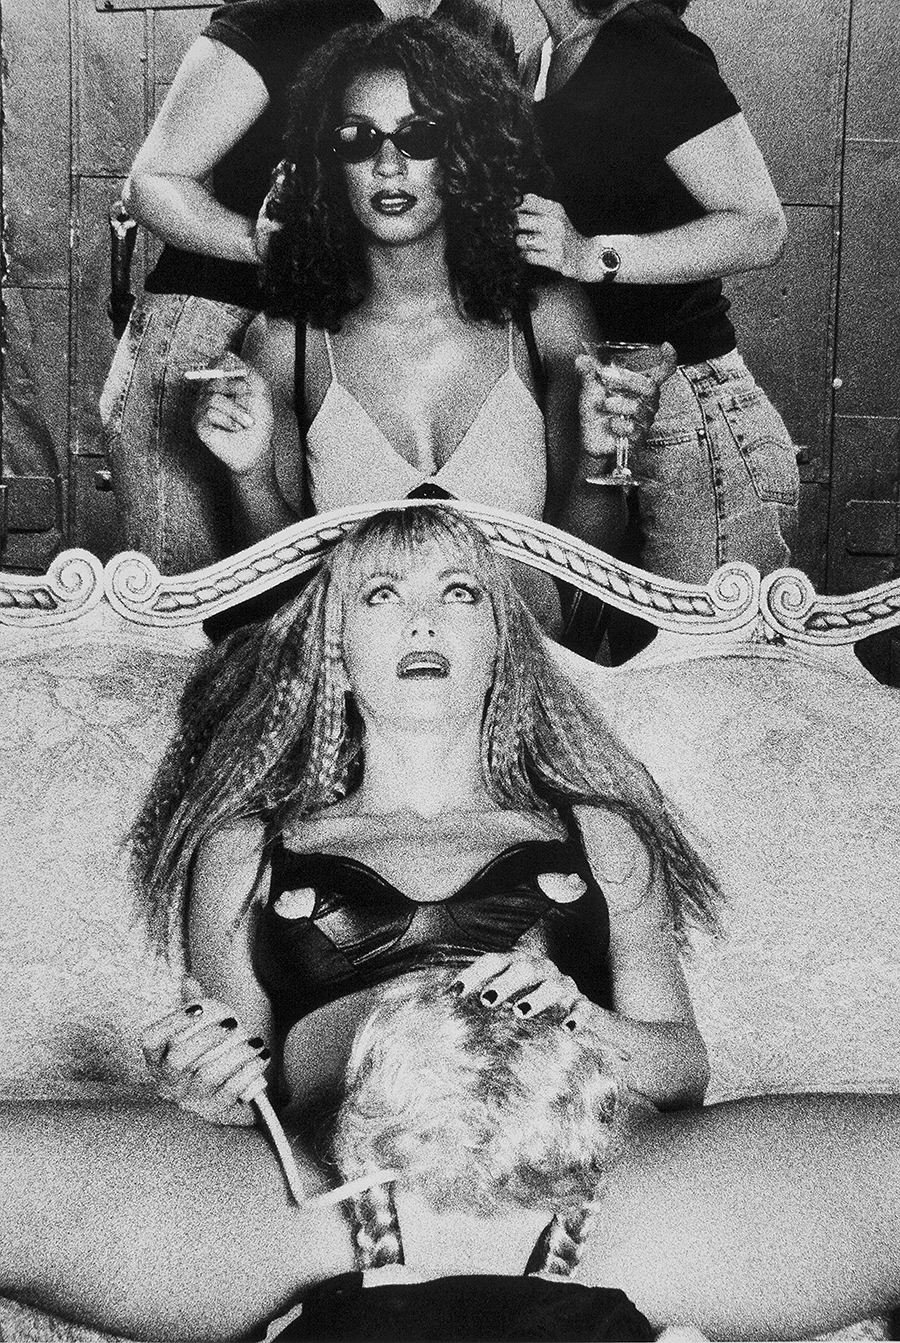 Tony_Ward_early_work_tableaux_vivants_sex_doll_lesbians